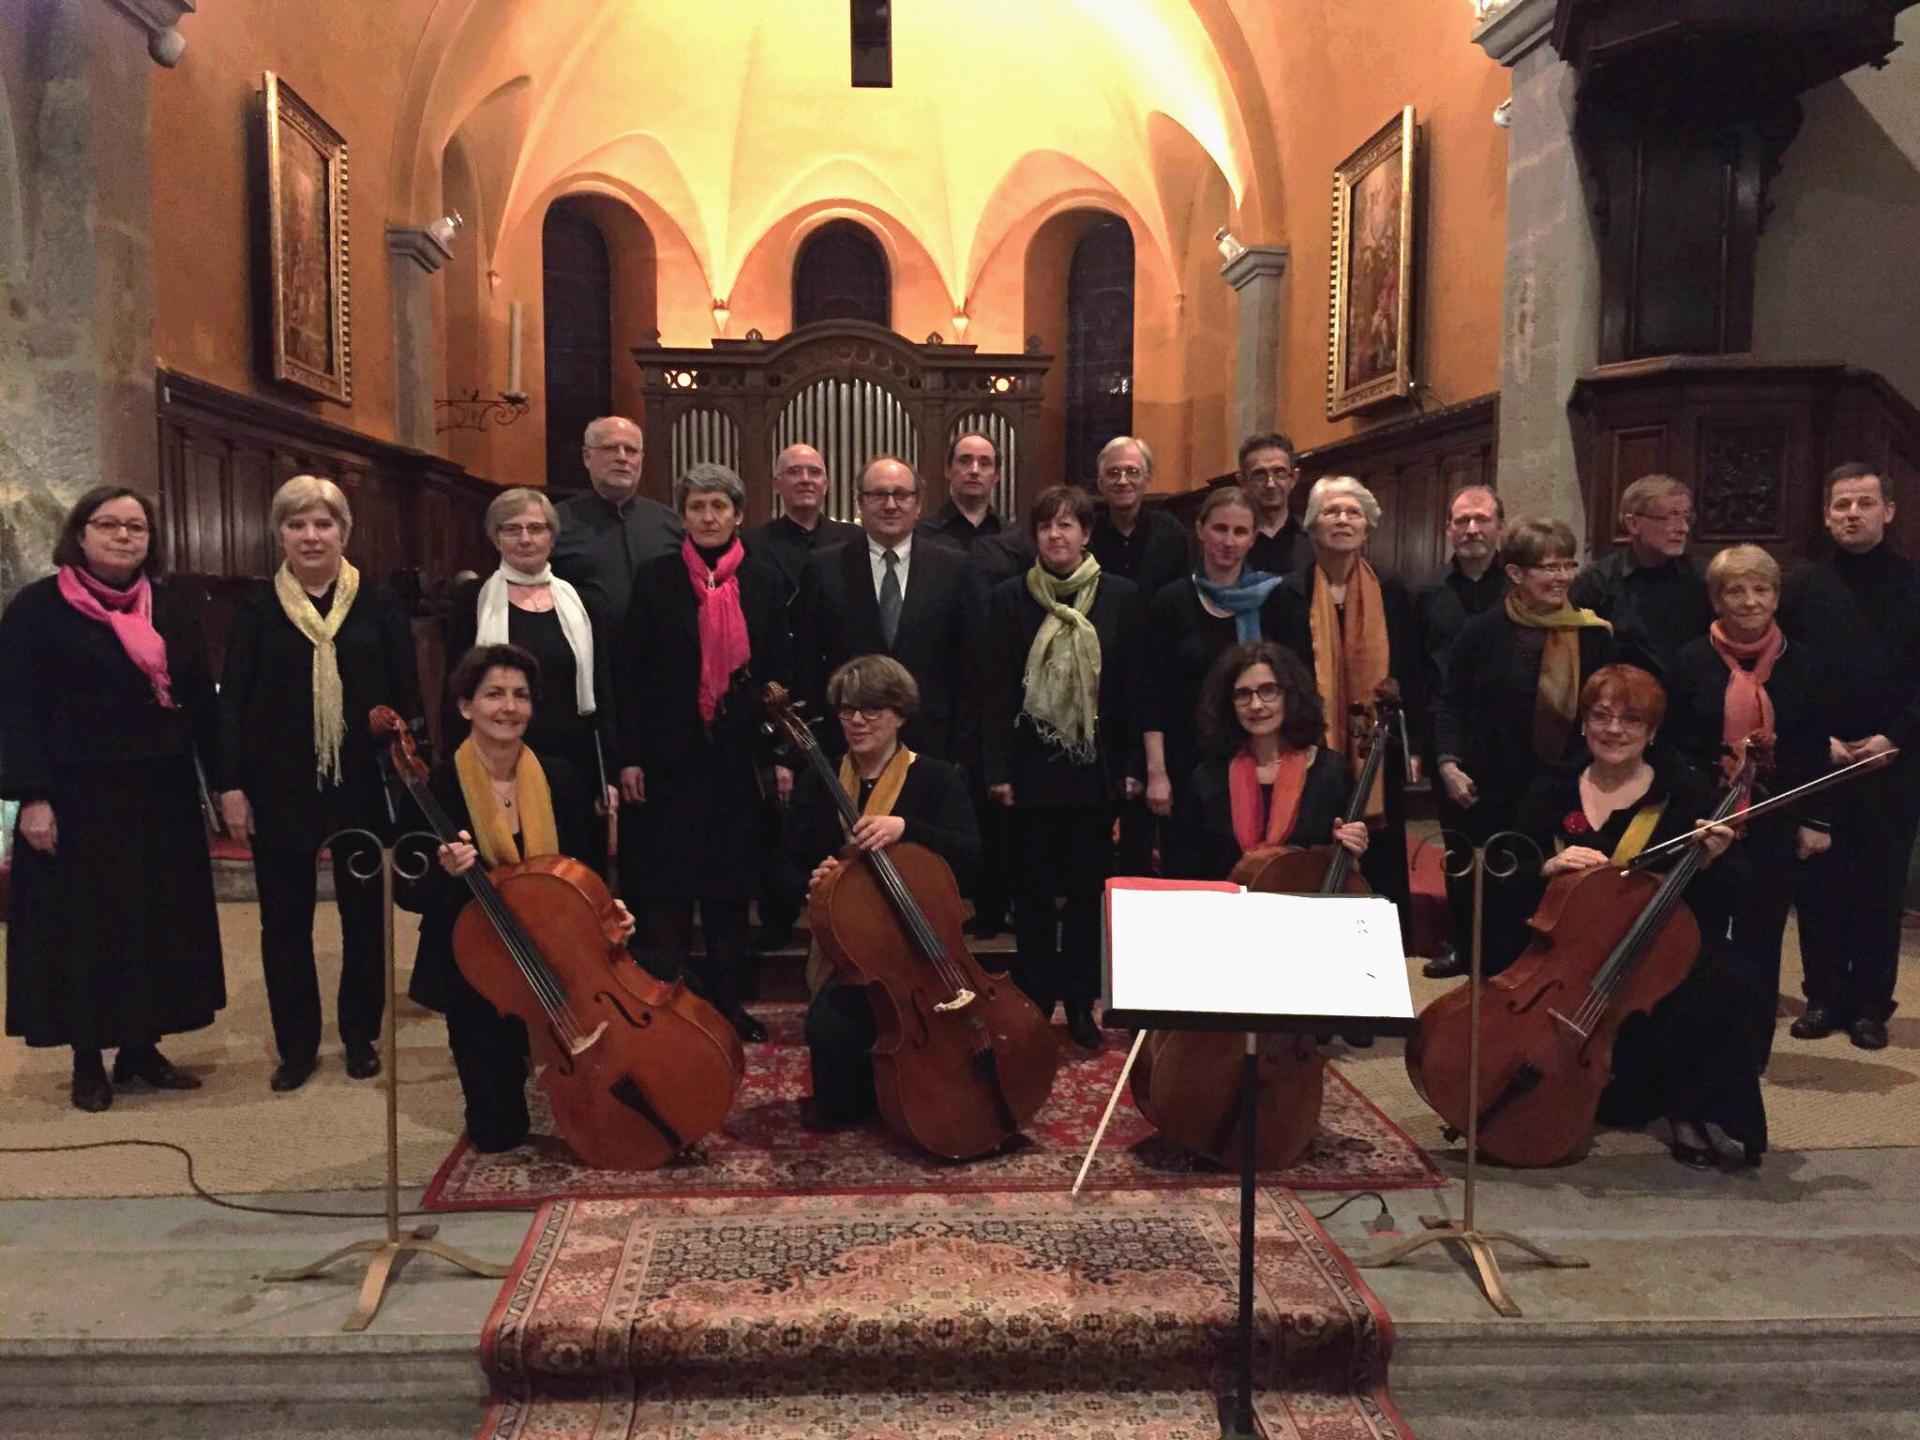 concert musique spirituelle 21-03-2015 A